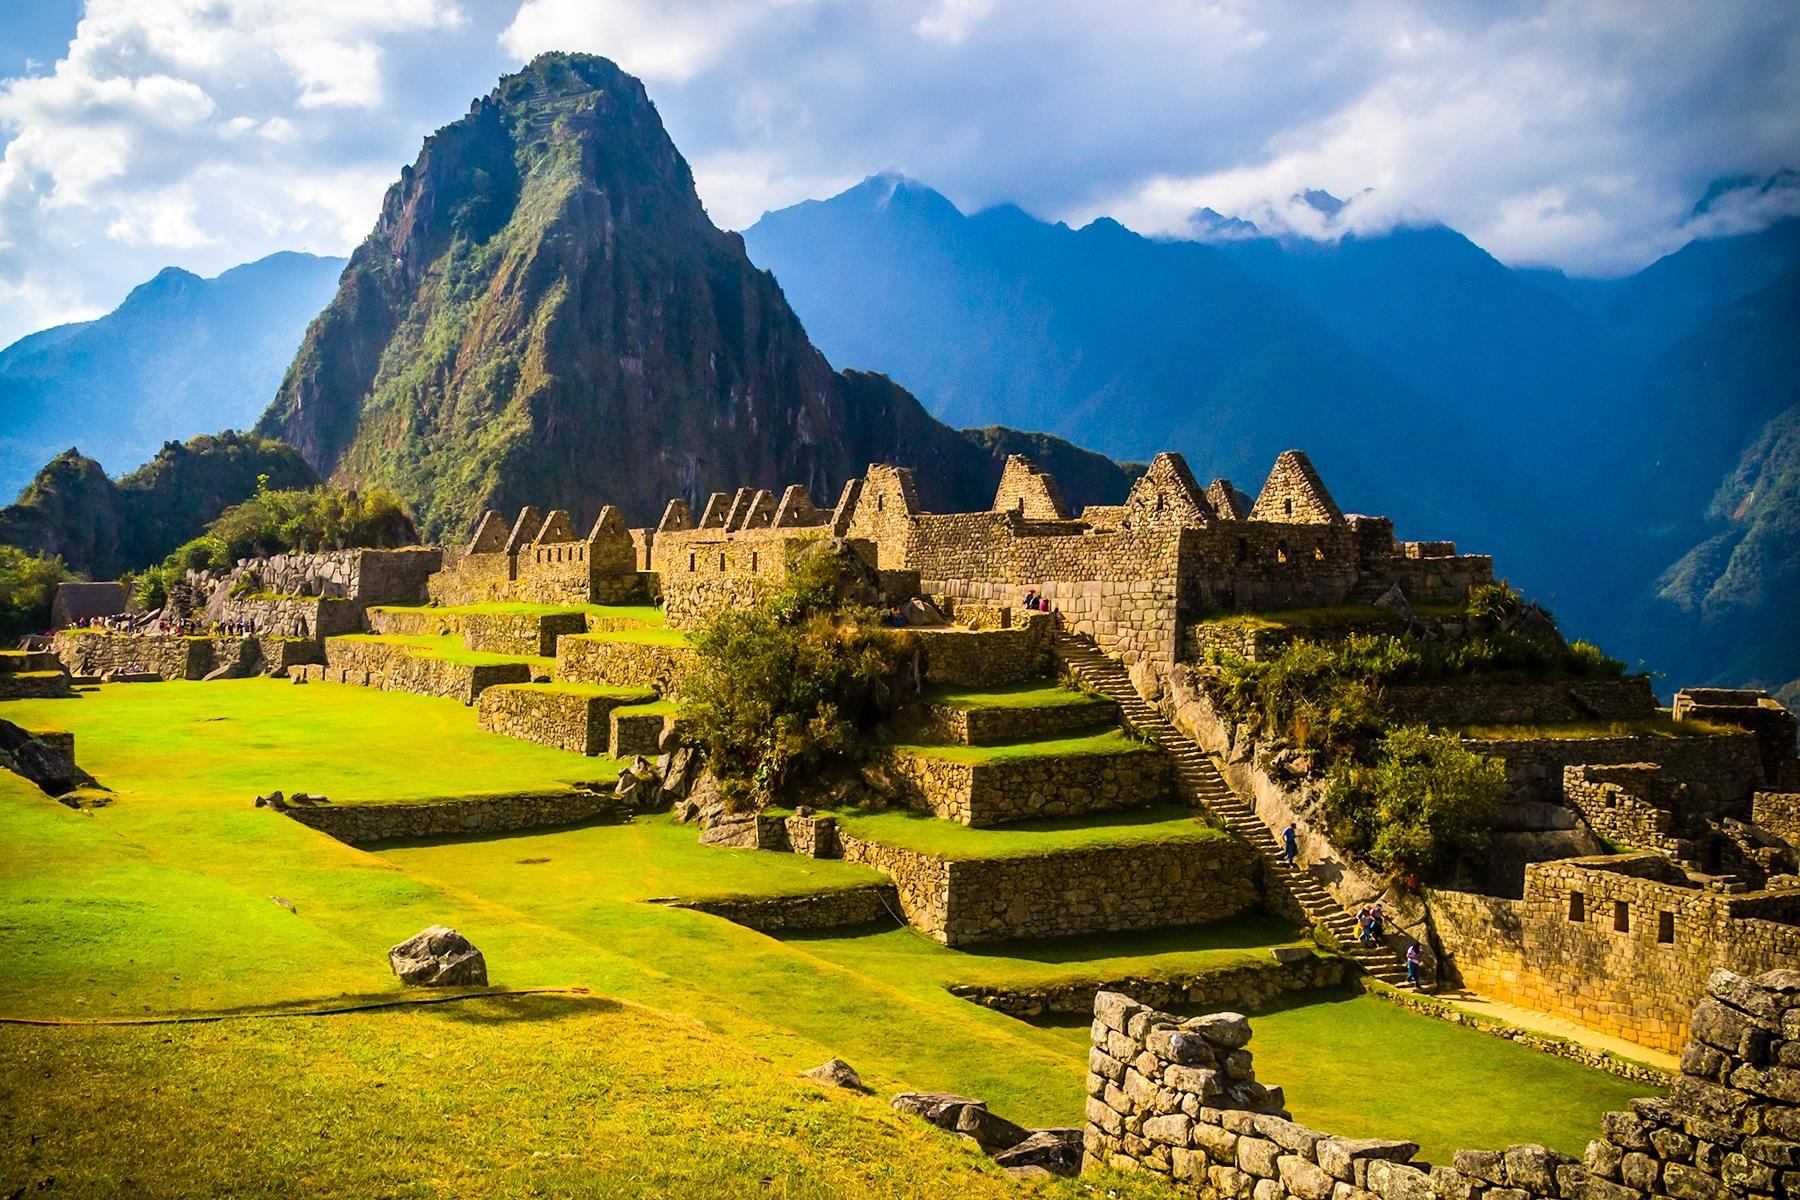 "Huayna-Picchu-Central-Plaza-at-Machu-Picchu-Huayna-Picchu-""young-peak""-in-Quechua-looms-865-feet-above-the-Central-Plaza-of-Machu-Picchu-TB-1-Place-by-Joel-David-Brown-SR"